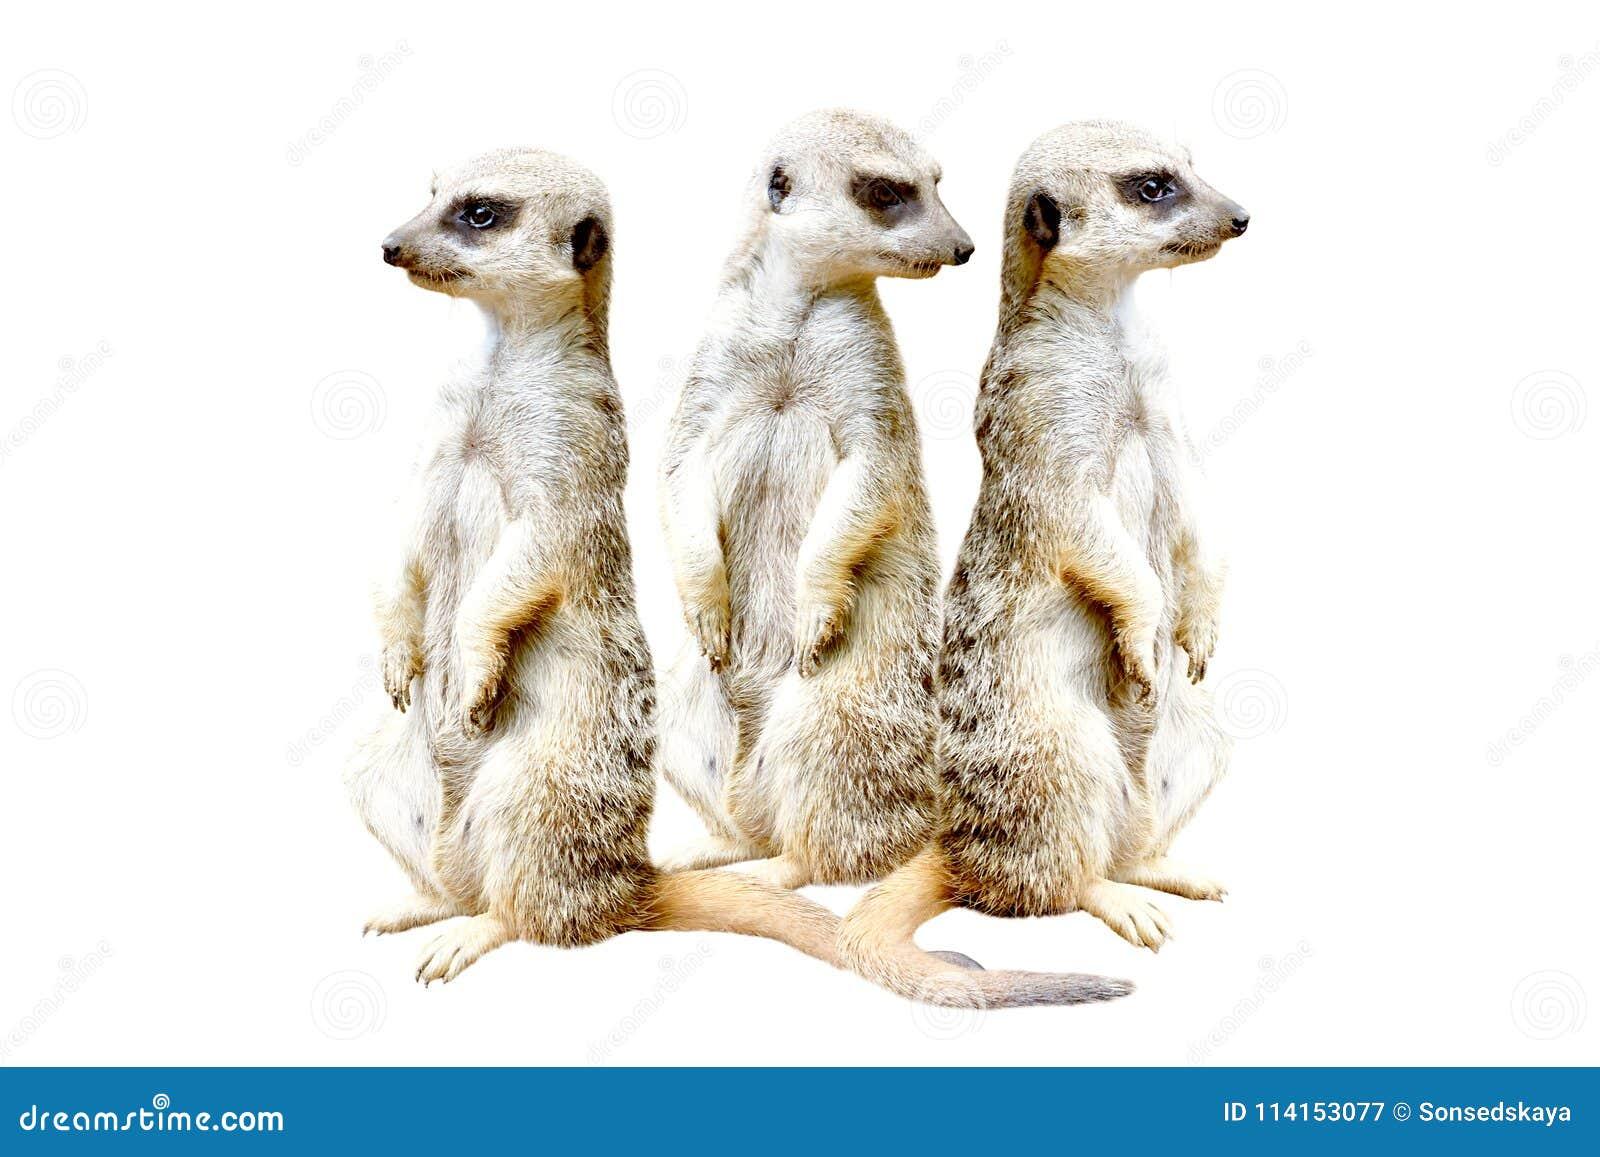 Trois meerkats se tenant ensemble